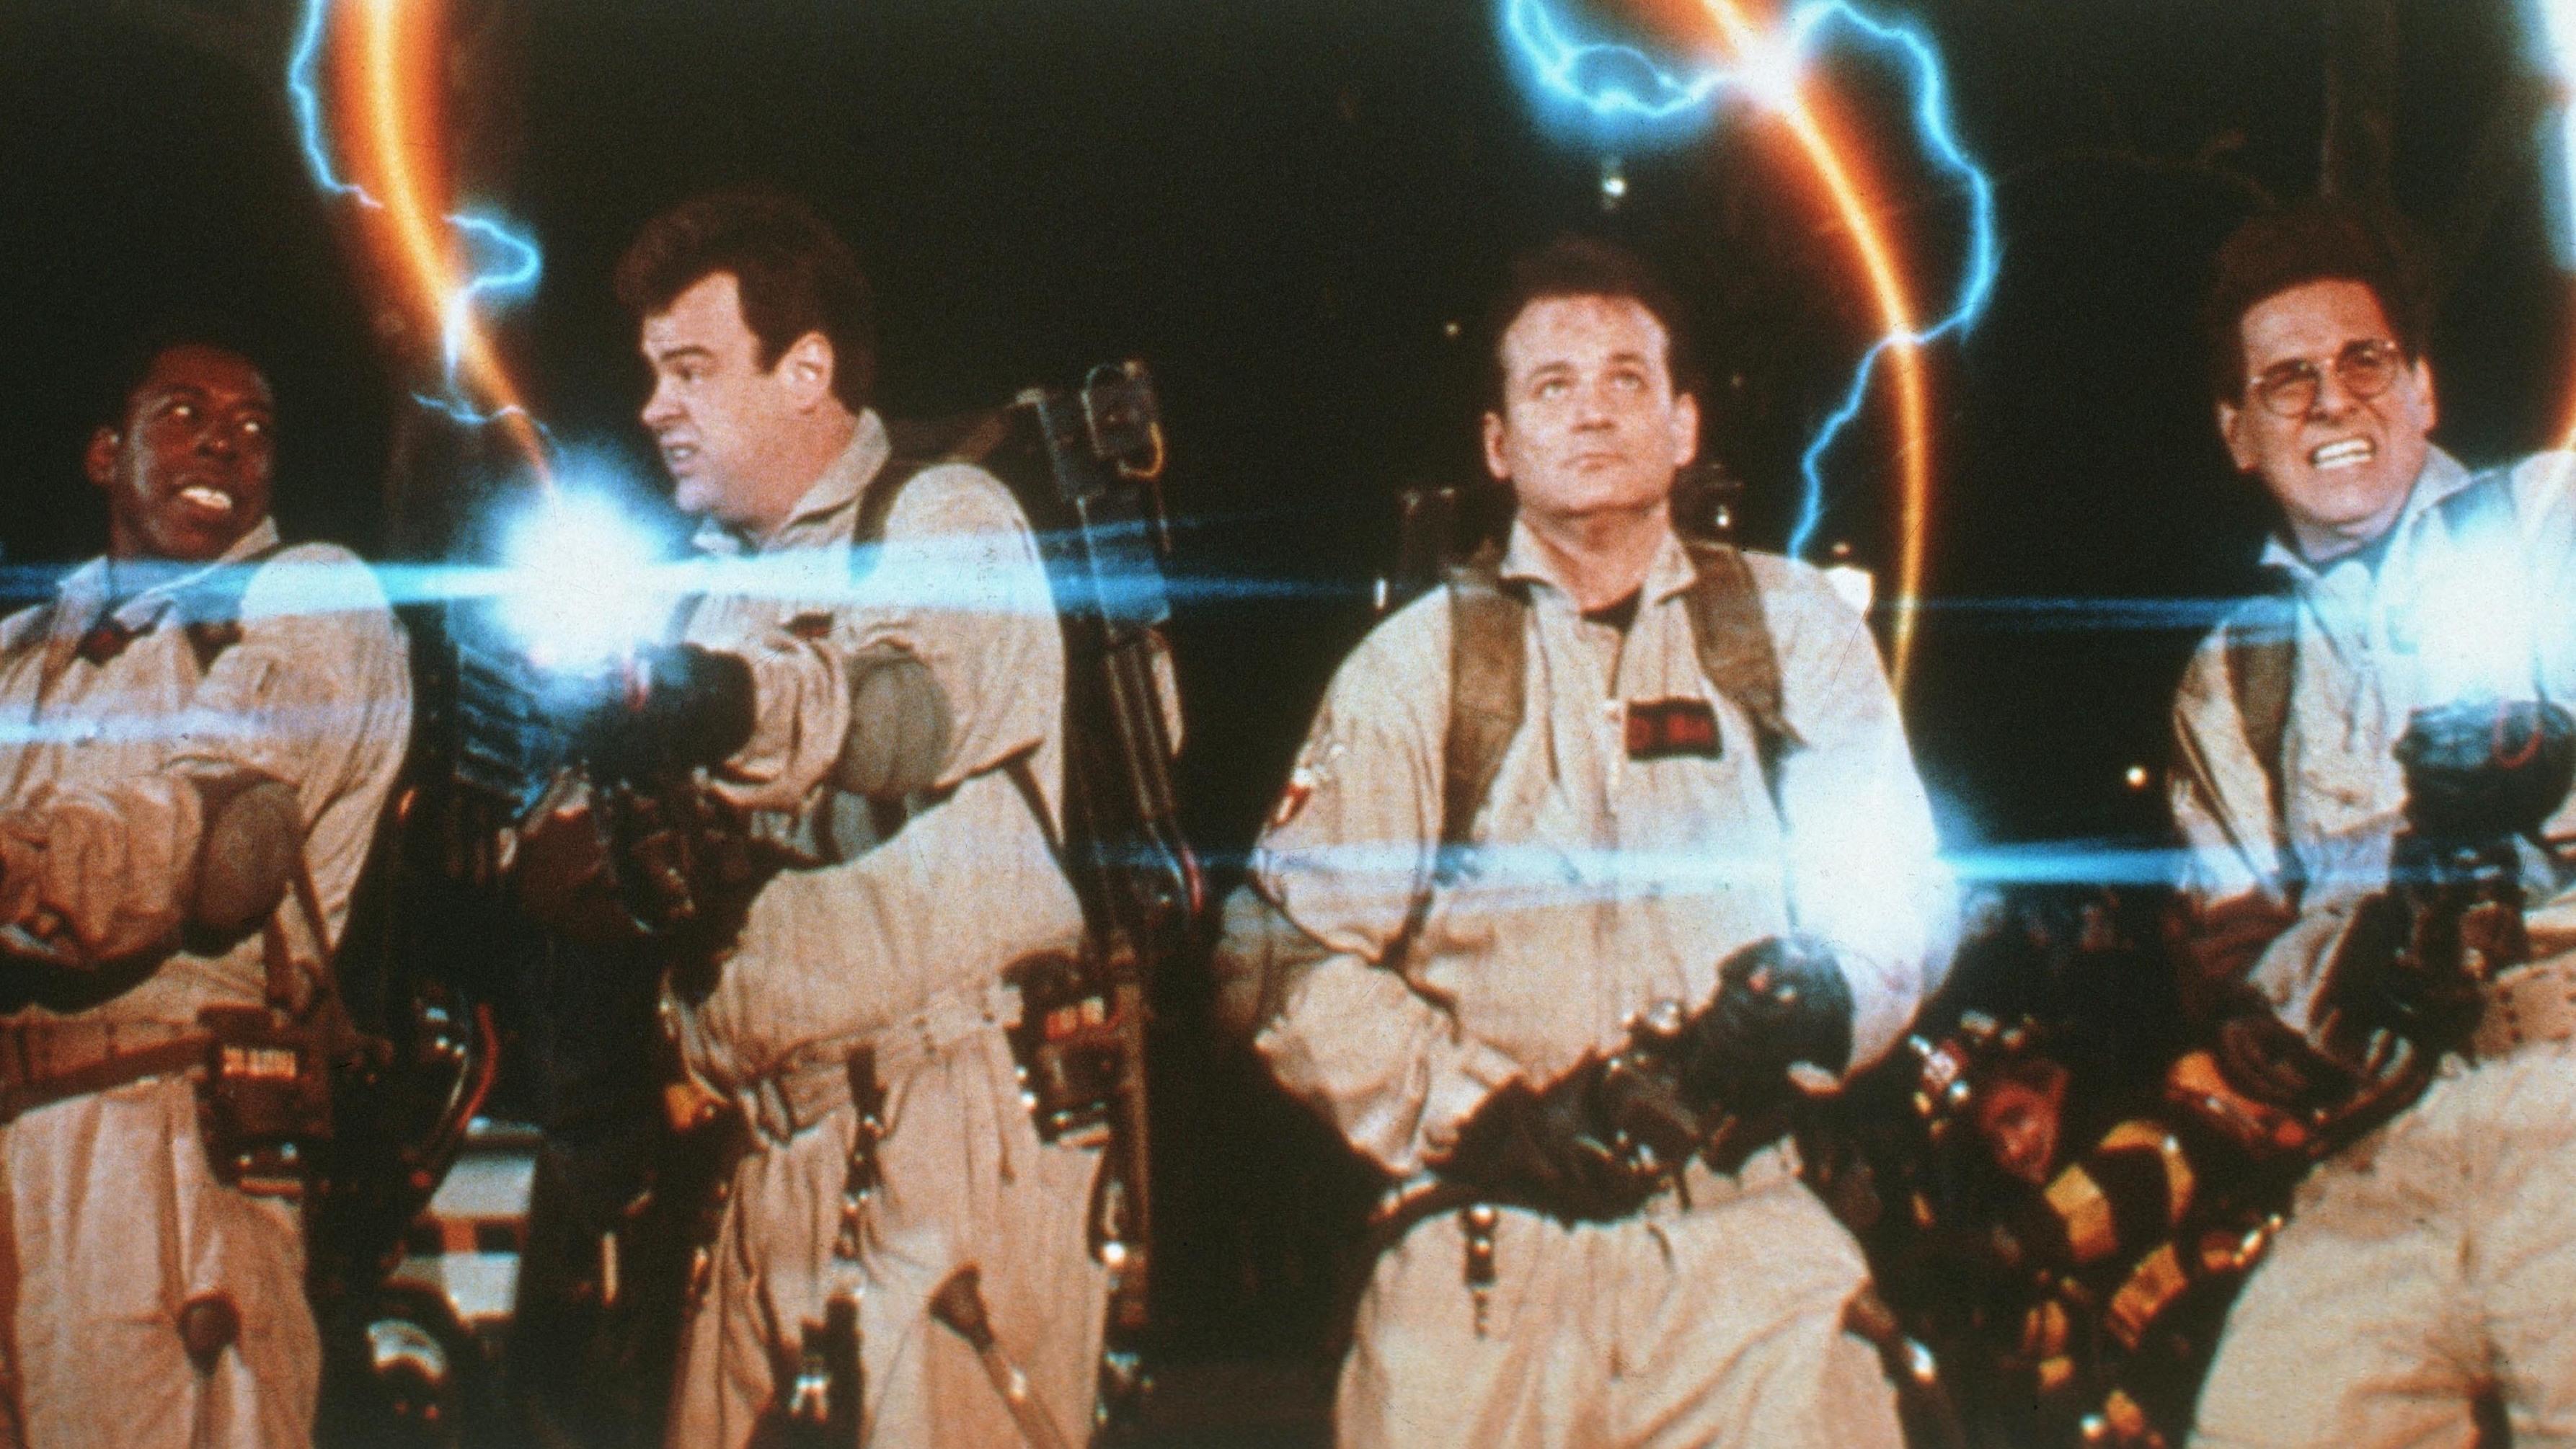 Ernie Hudson, Dan Aykroyd, Bill Murray, and Harold Ramis in 1984's Ghostbusters.